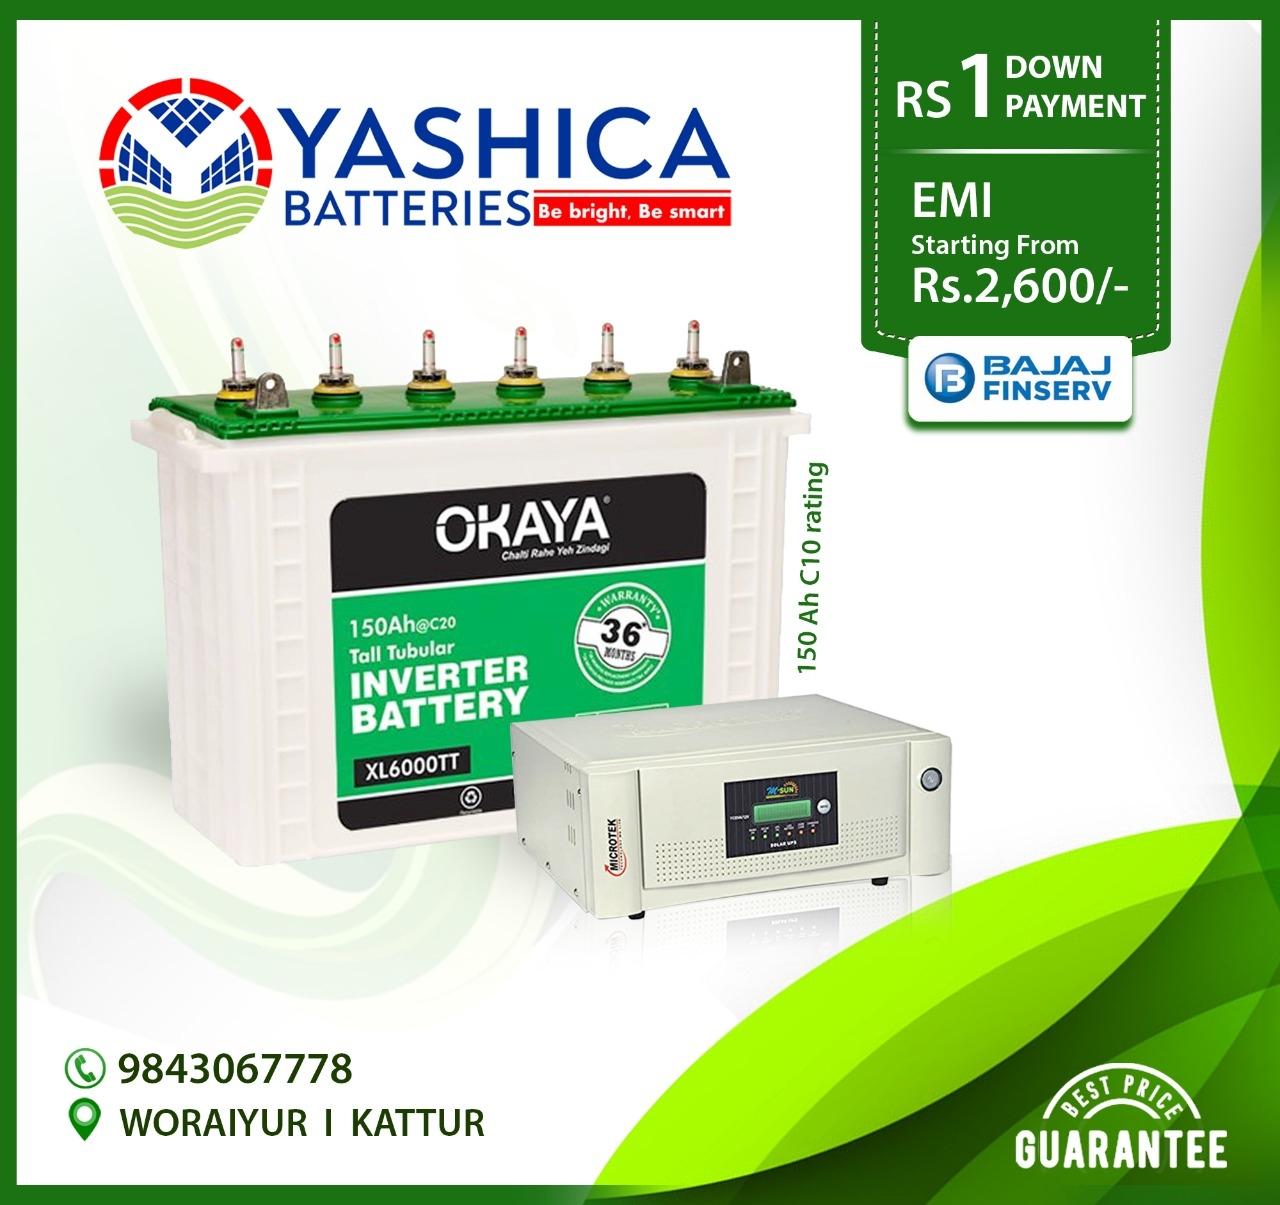 yashicabatteries (@yashicabatteries) Cover Image